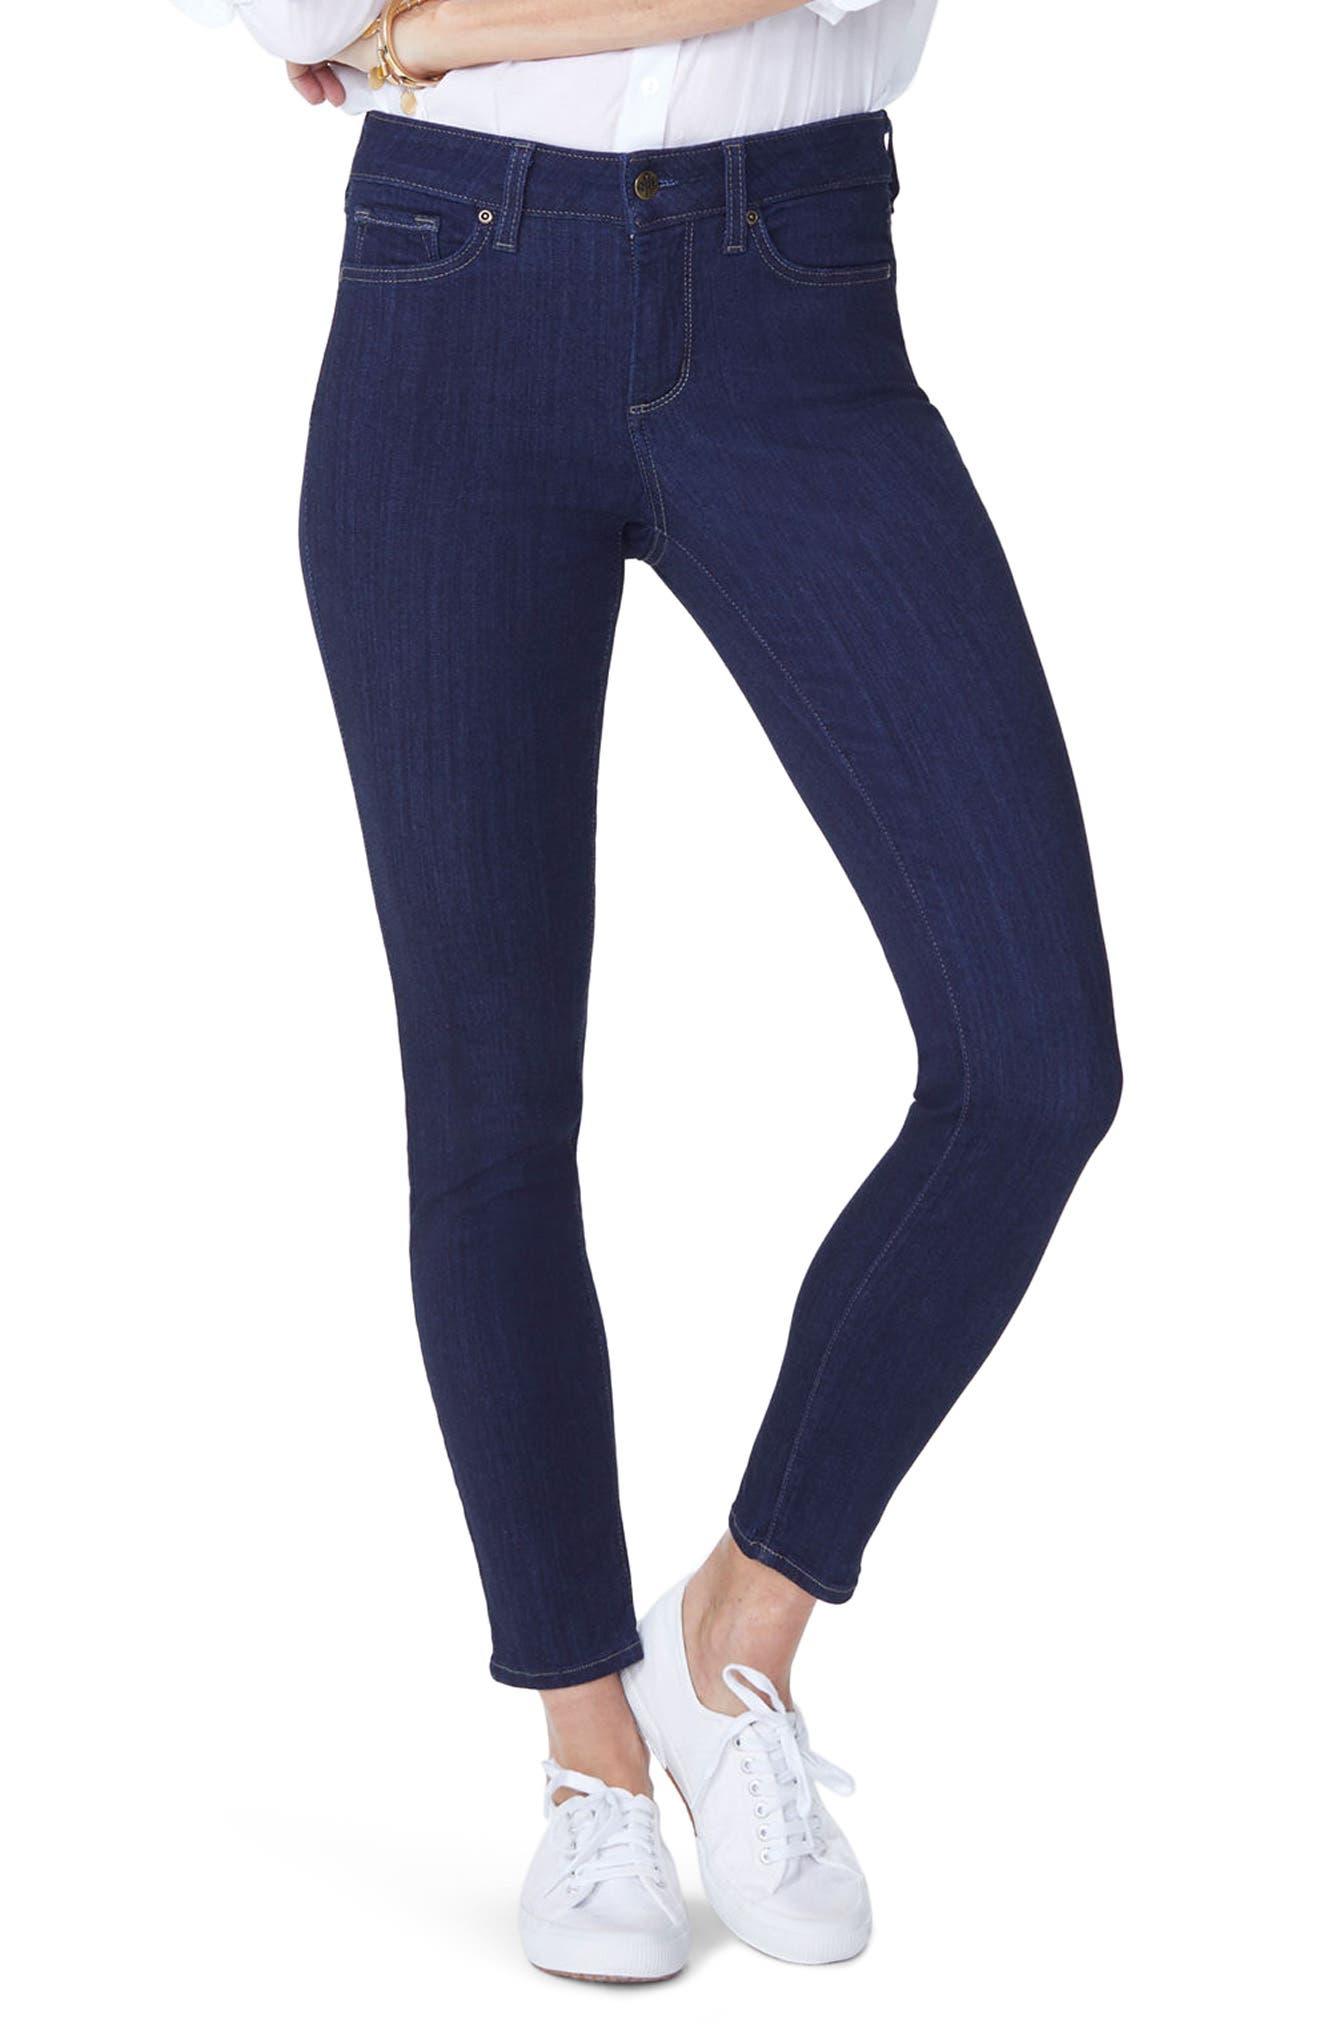 Ami Skinny Jeans,                             Main thumbnail 1, color,                             464